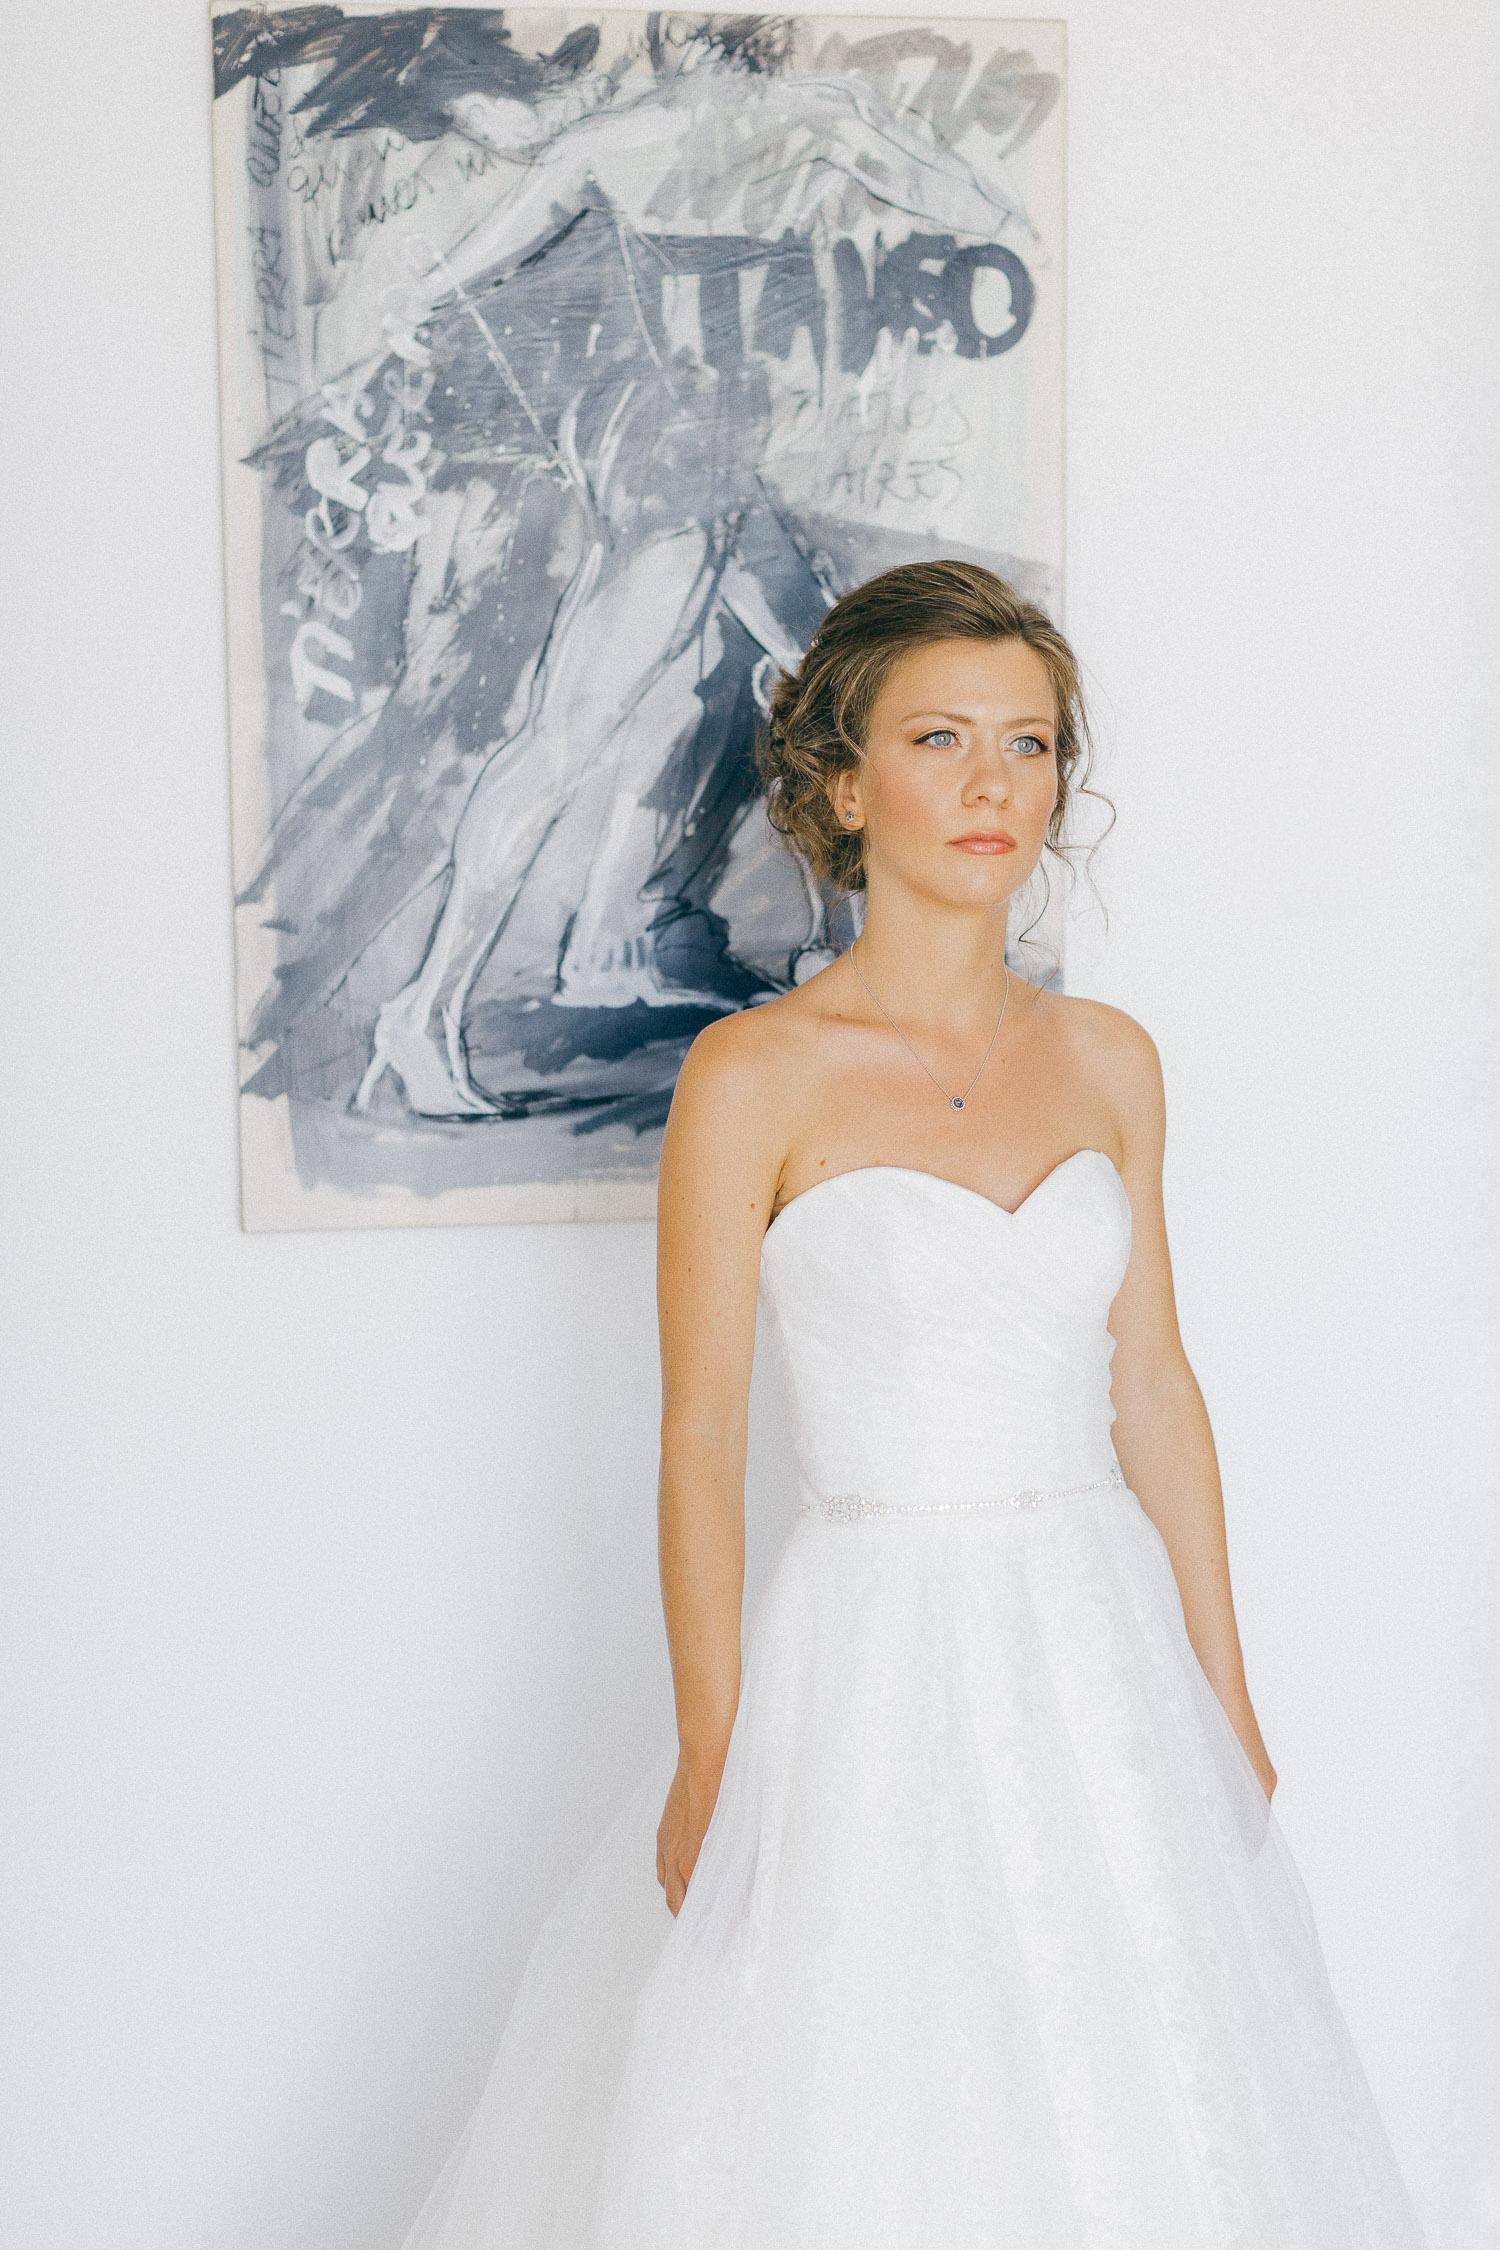 Minimal bridal portrait before she walks down the isle at an Old World micro wedding in Corfu island